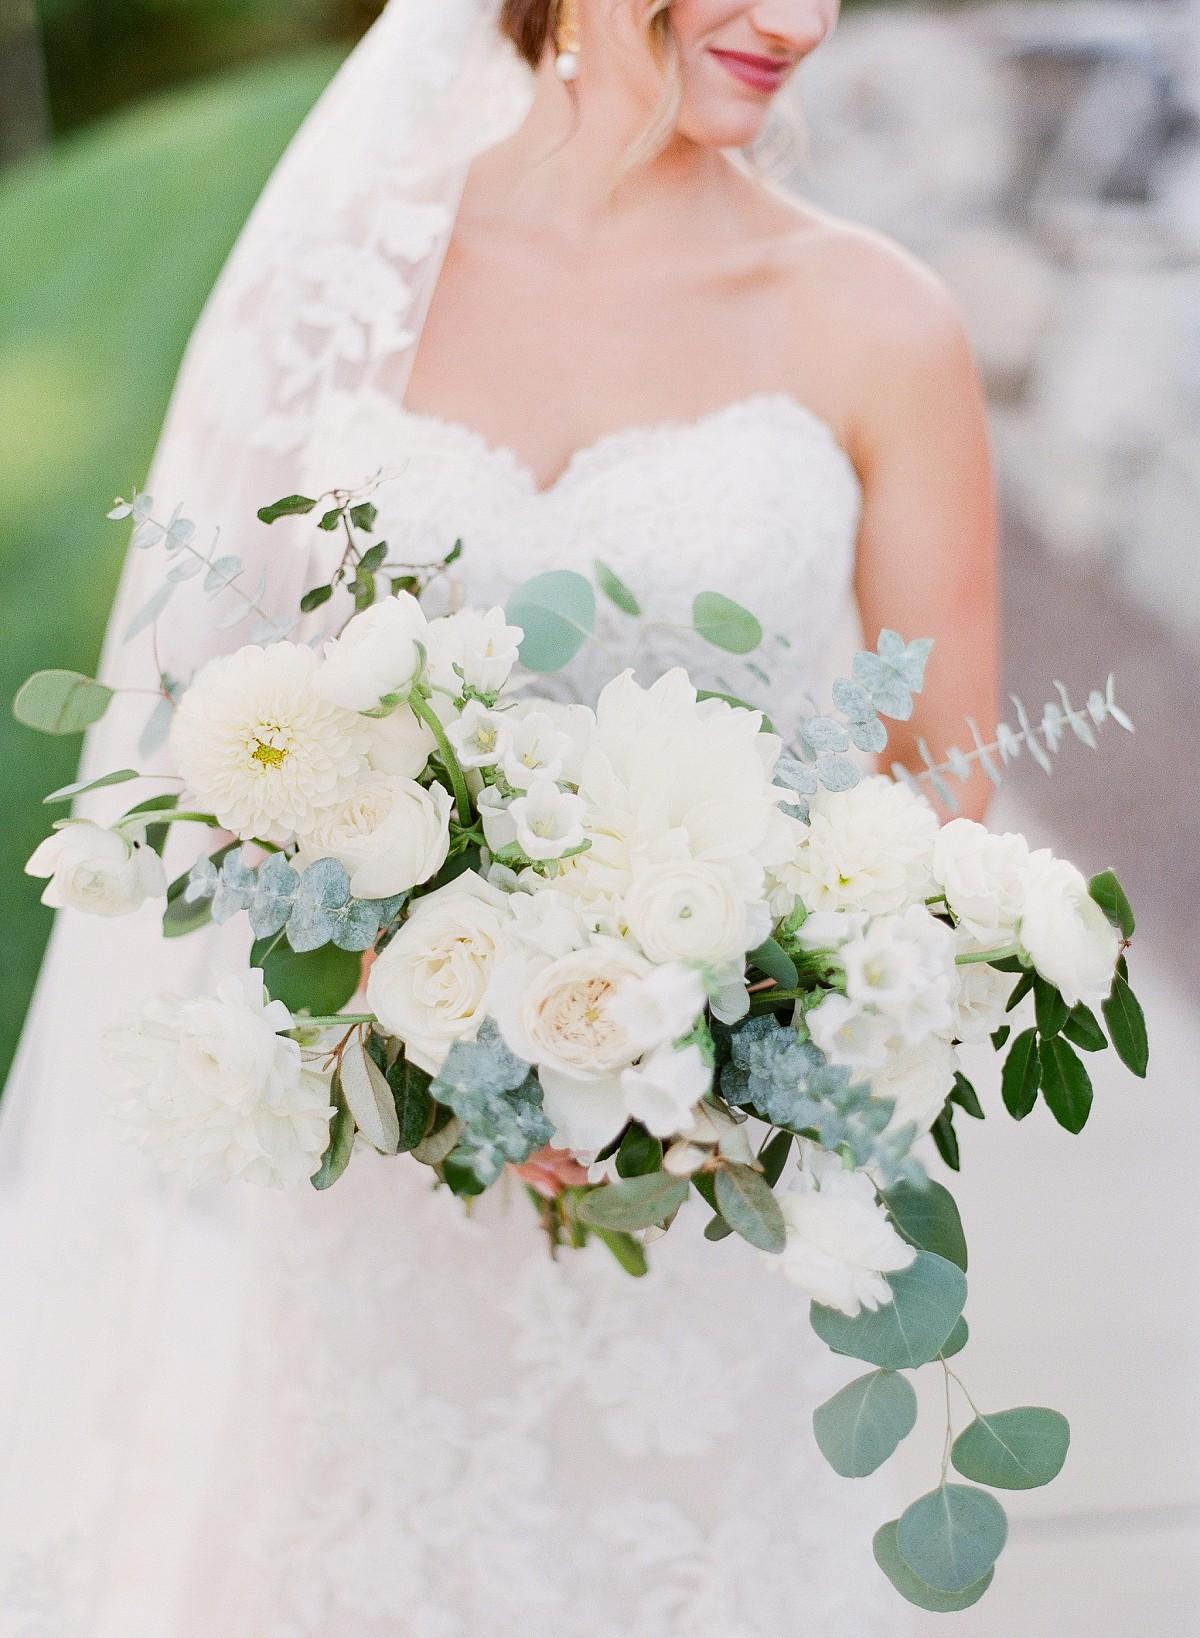 Postponed Wedding in a White Barn Venue